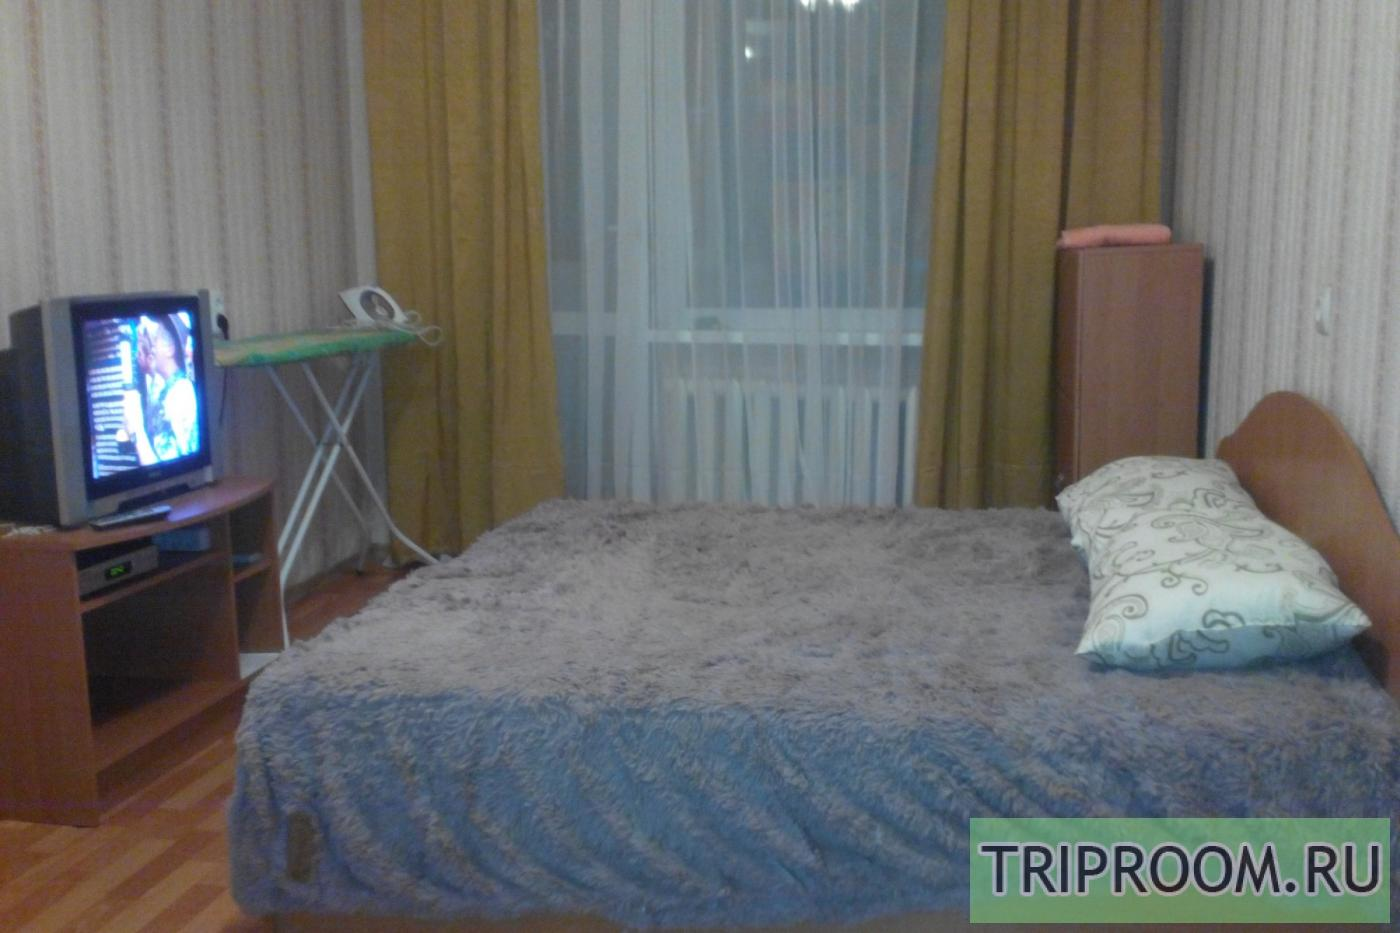 1-комнатная квартира посуточно (вариант № 30535), ул. Лермонтова улица, фото № 1